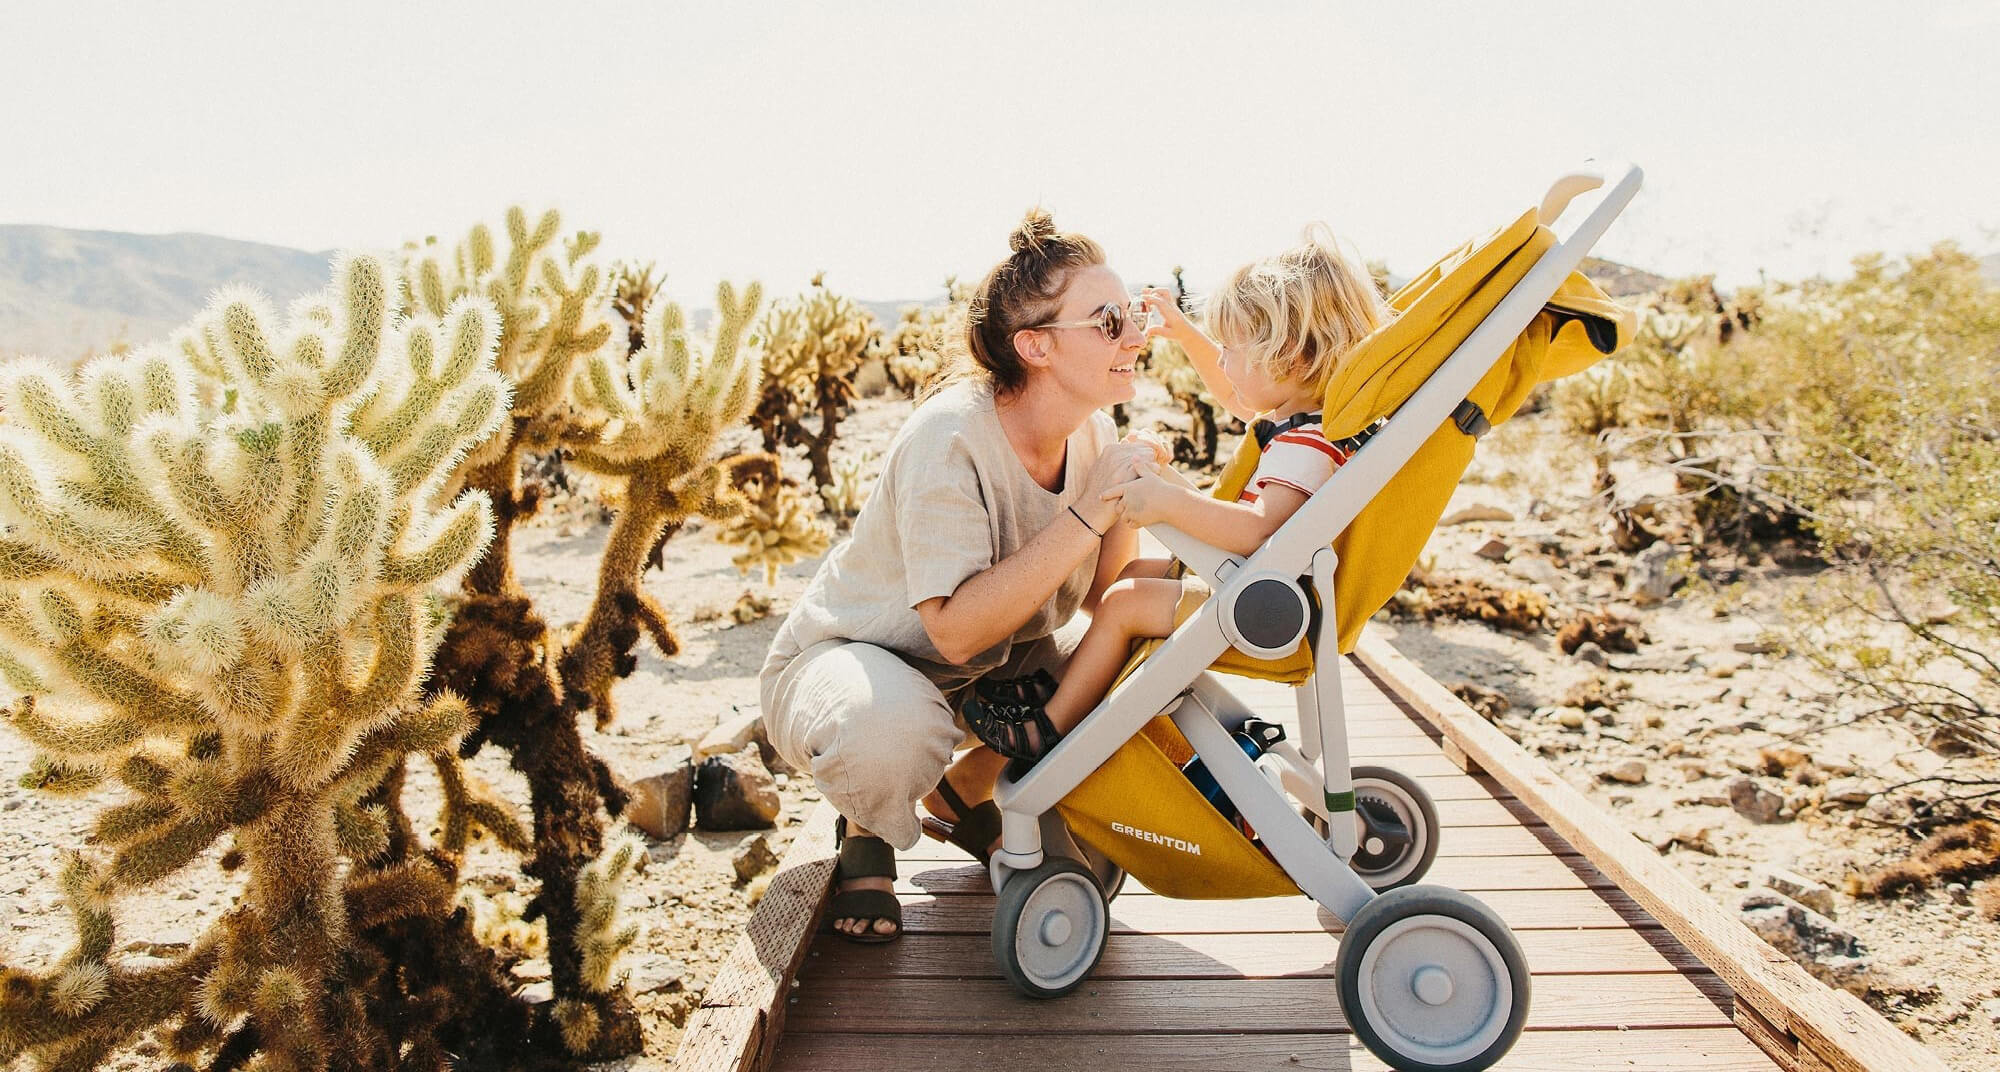 greentom-classic-stroller-yellow